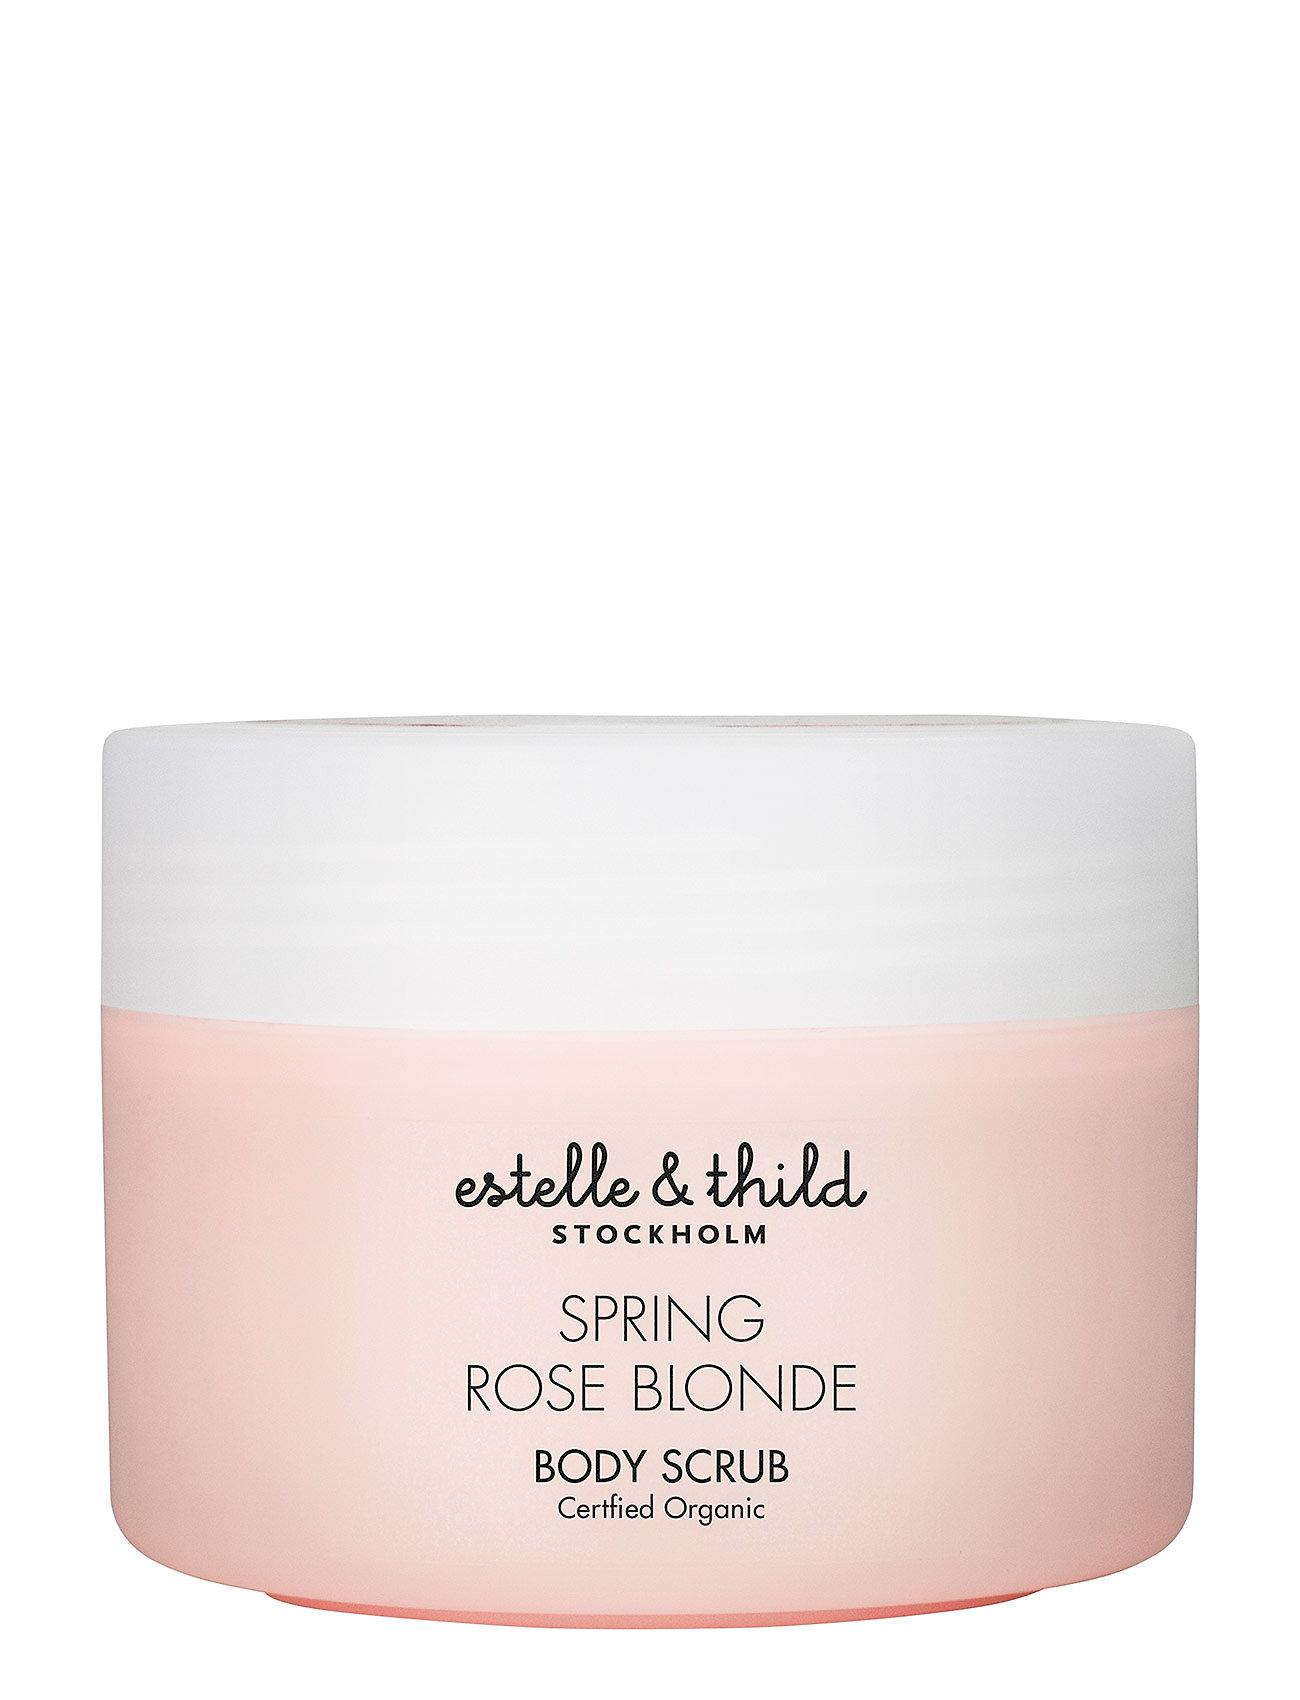 Spring Rose Blonde Body Scrub - Estelle & Thild